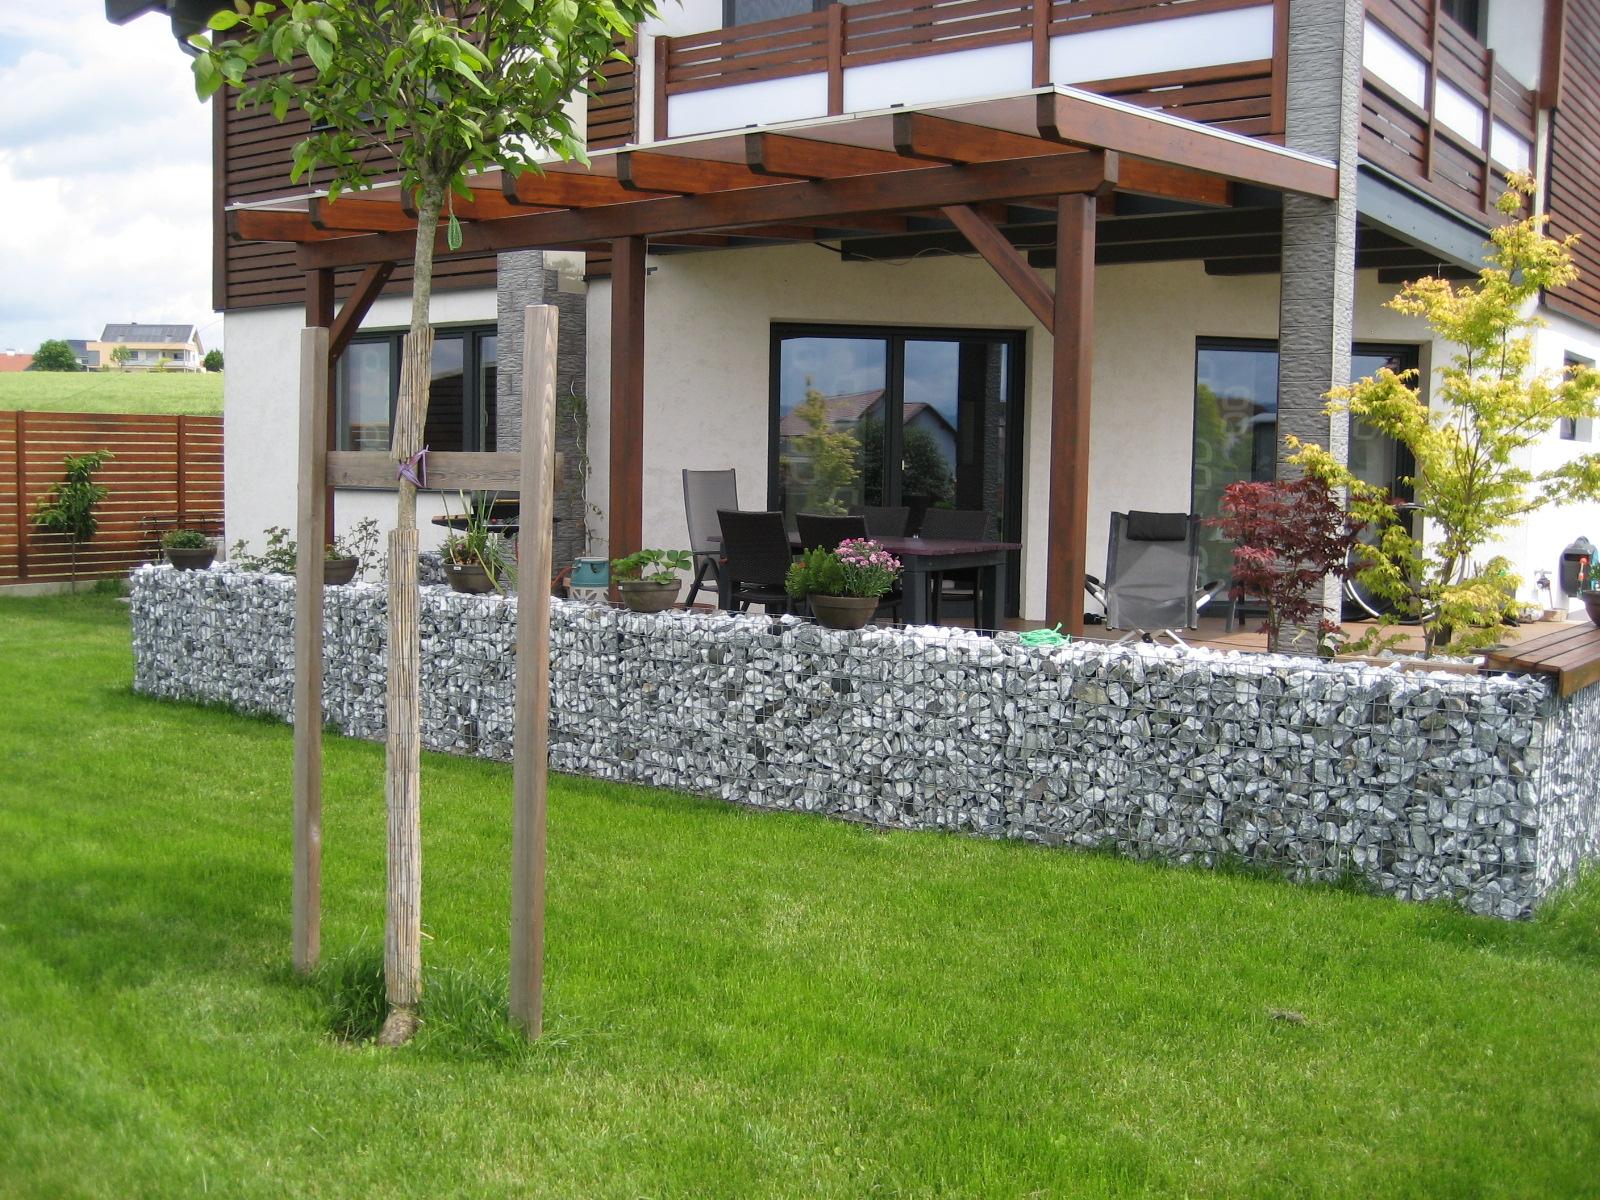 Terrassenüberdachung mit Thermoclear Stegplatten